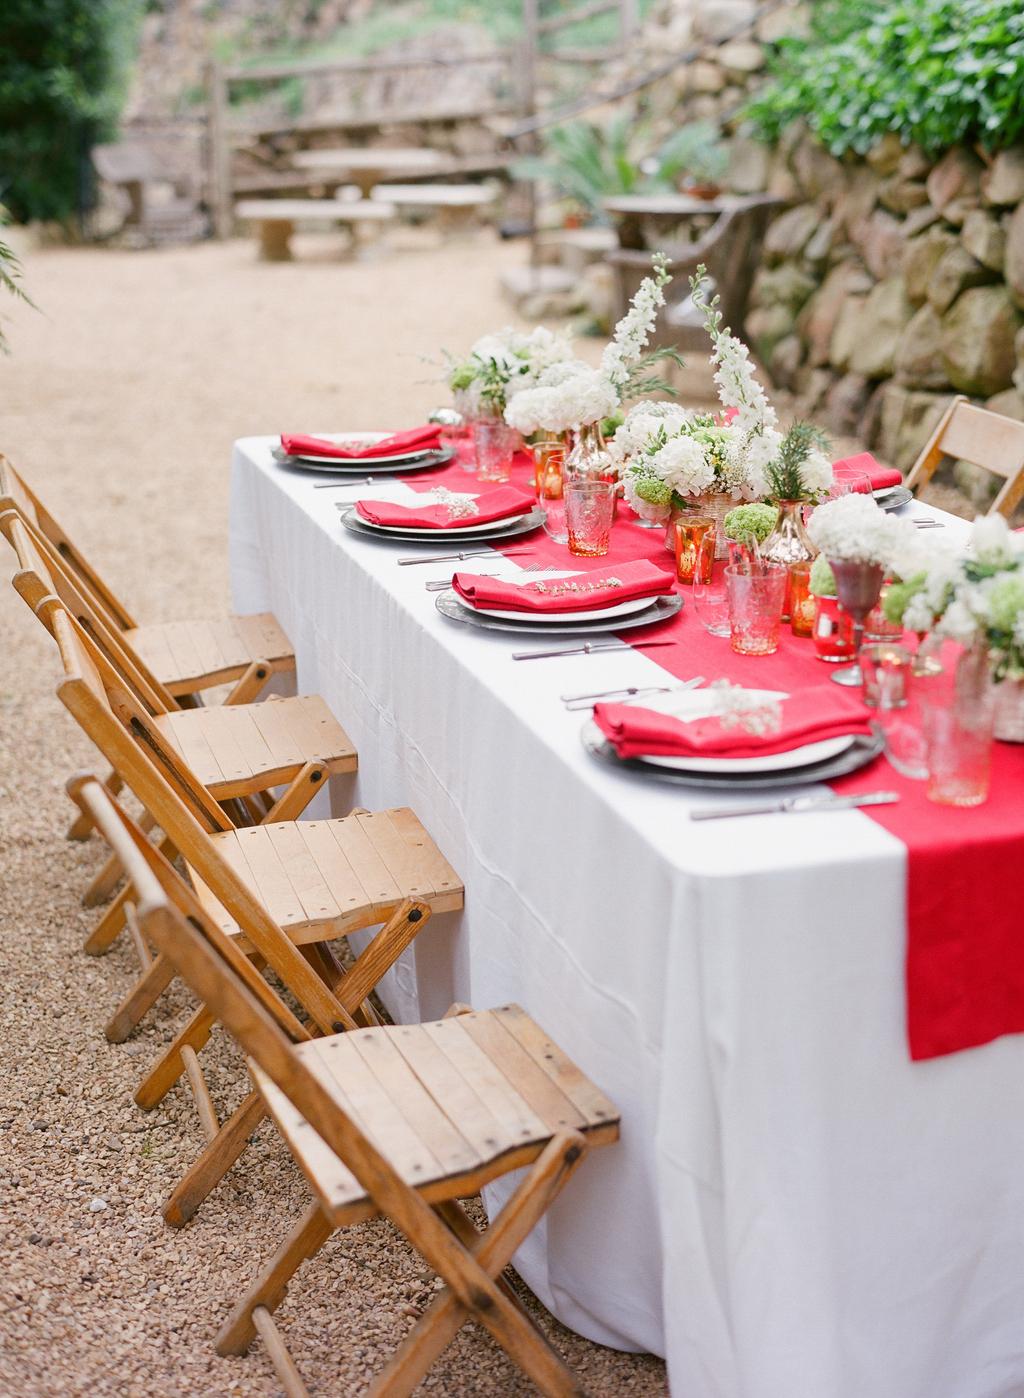 Styled-wedding-santa-barbara-chic-beaux-arts-photographie-italian-bohemian-wedding-venue-table-setting-red-white-flowers-antique-glass-069.full